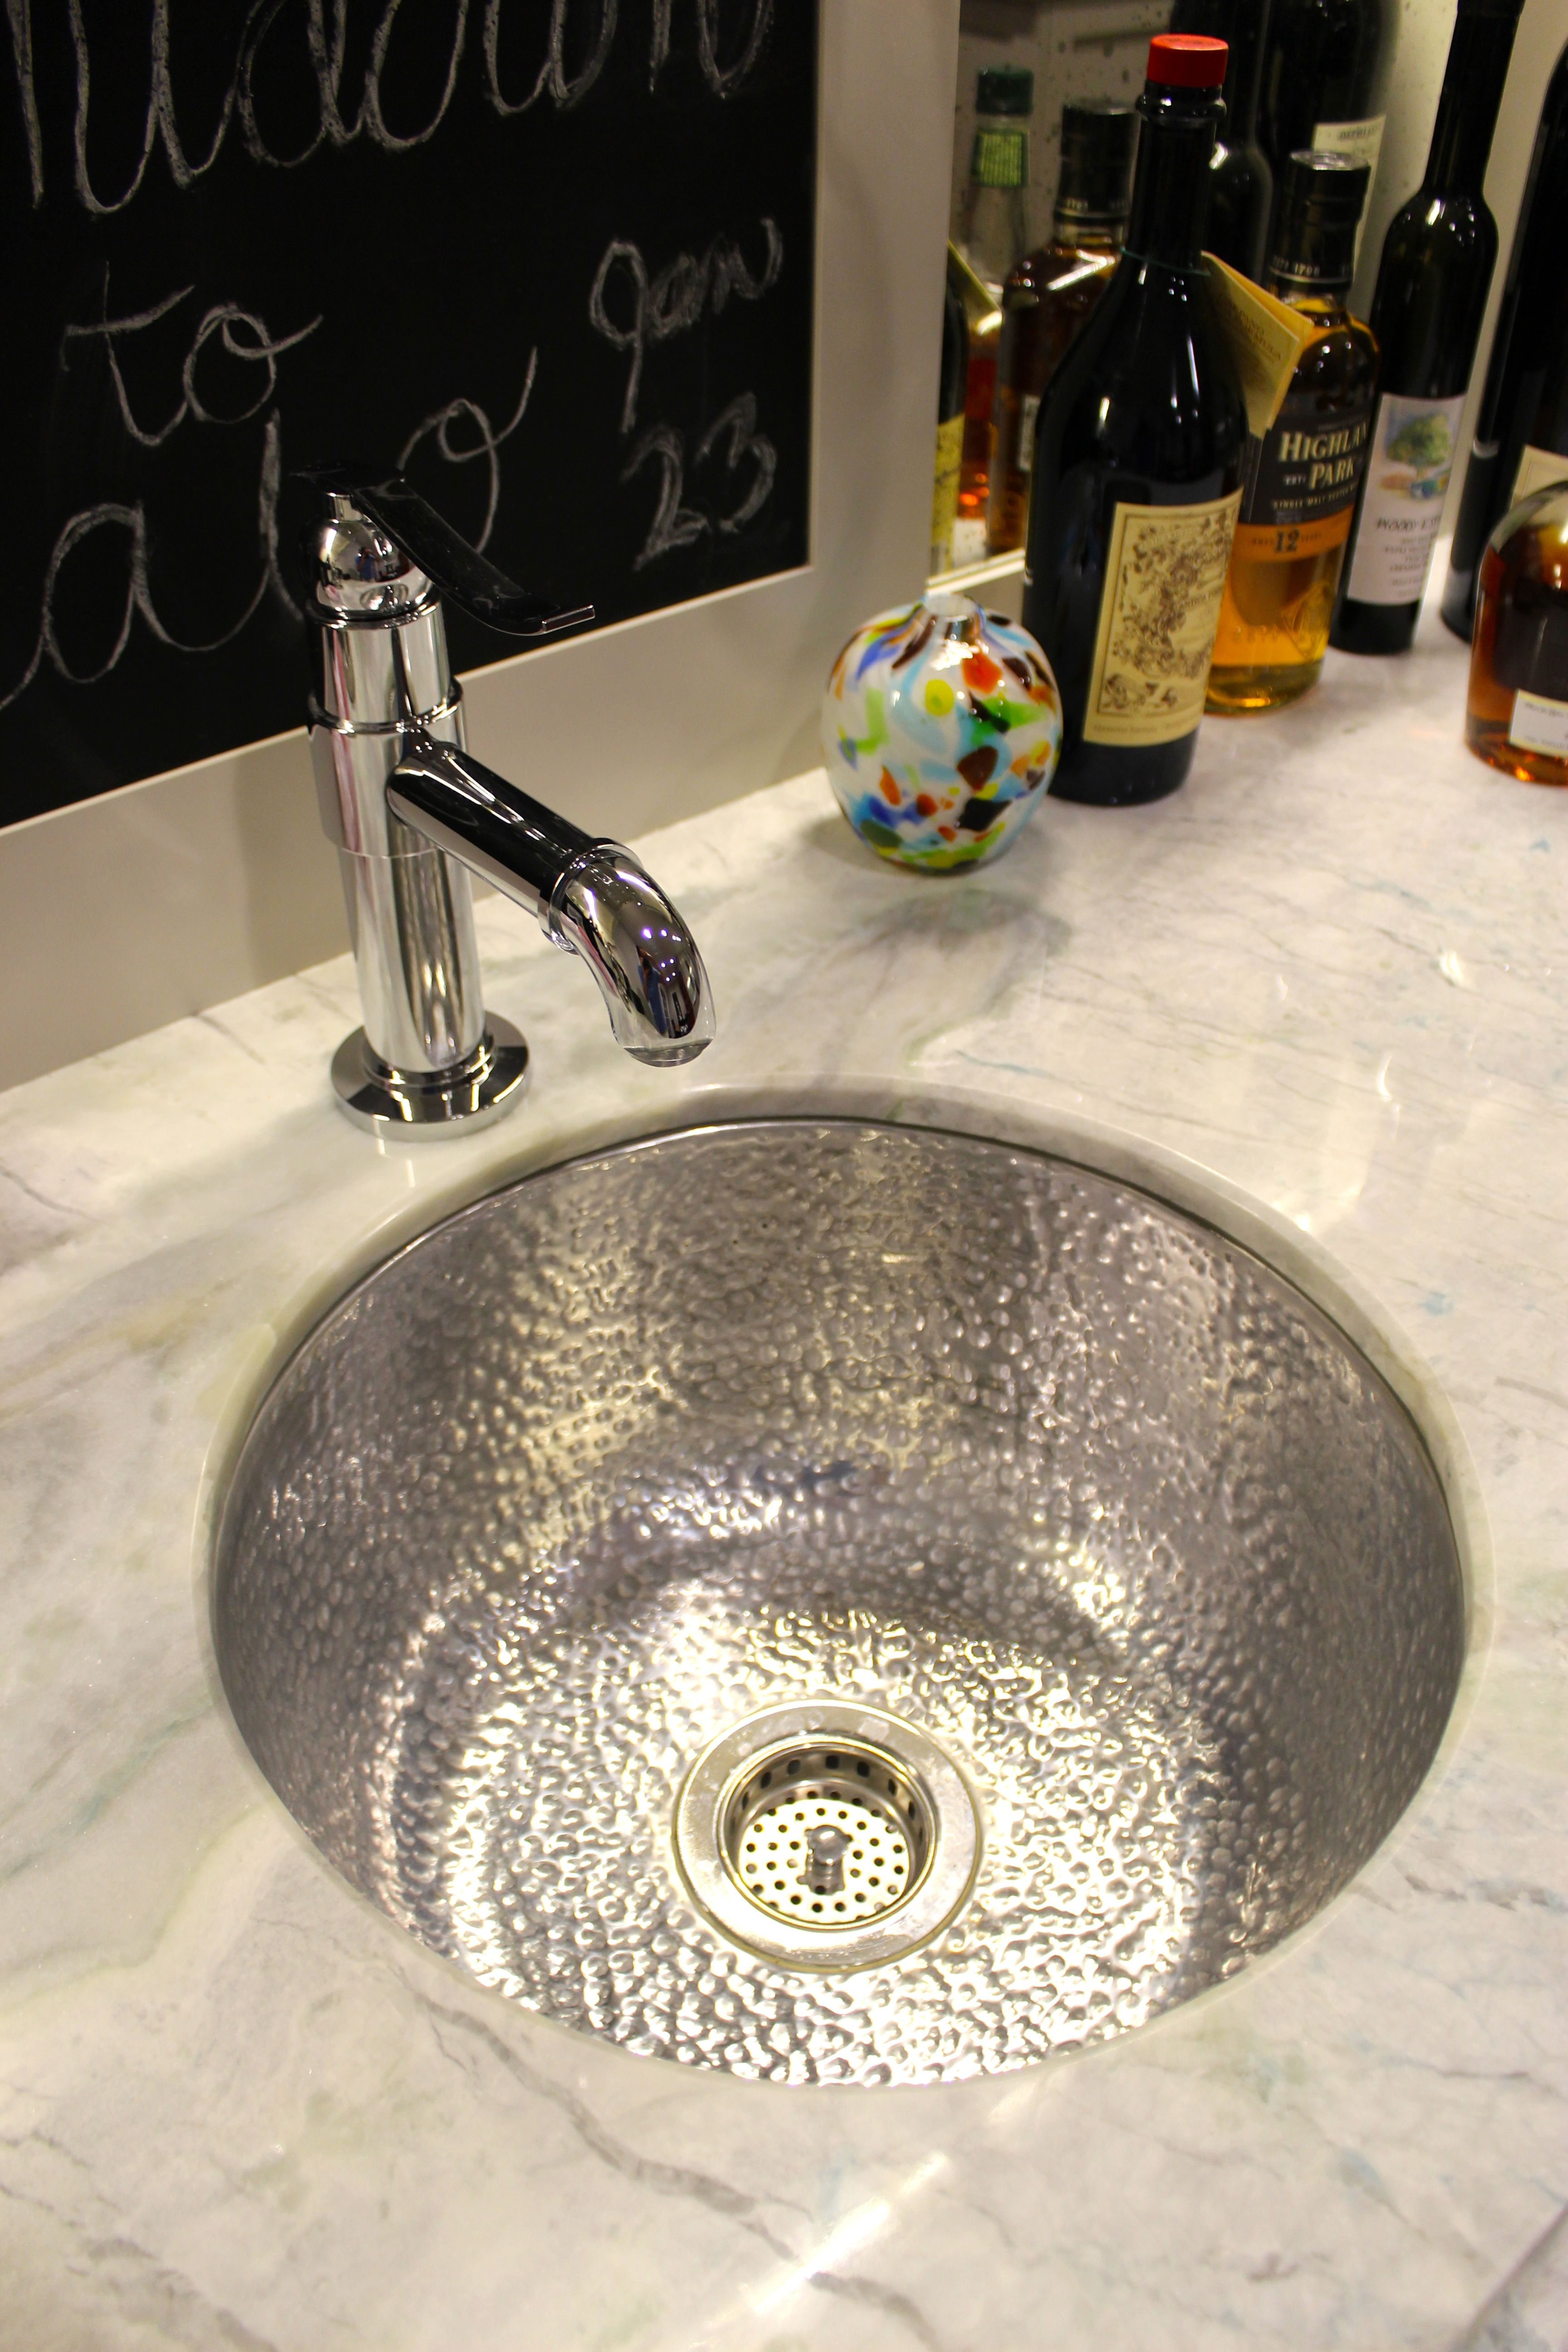 bates bates polished alloy undermount drop in bar sink graff polished chrome single hole lavatory faucet princess white bar sink undermount bar sink cullom